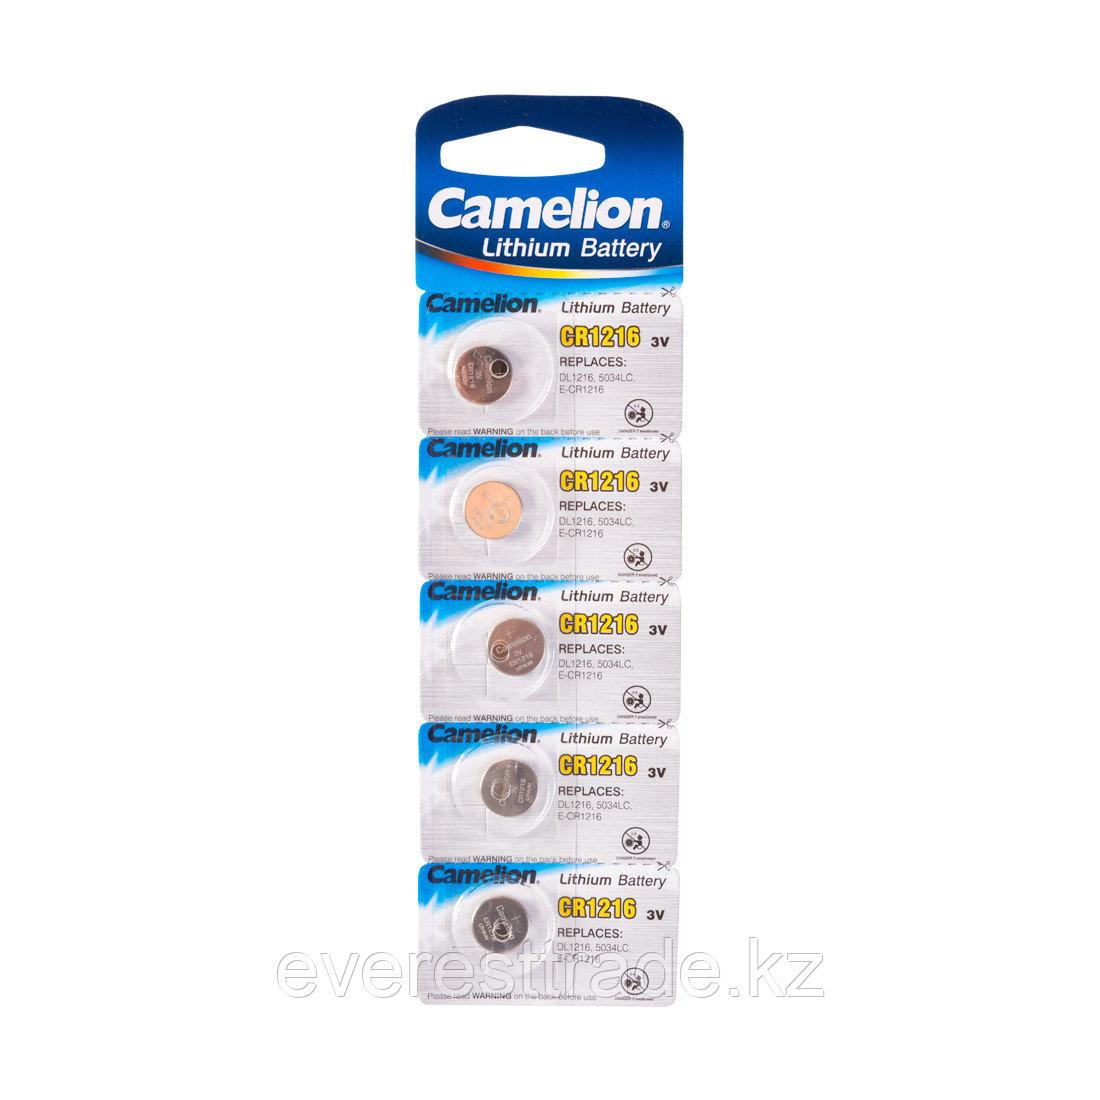 Camelion Батарейка, CAMELION, CR1216-BP5 Lithium Battery, CR1216 3V, 220 mAh, 5 шт. в блистере